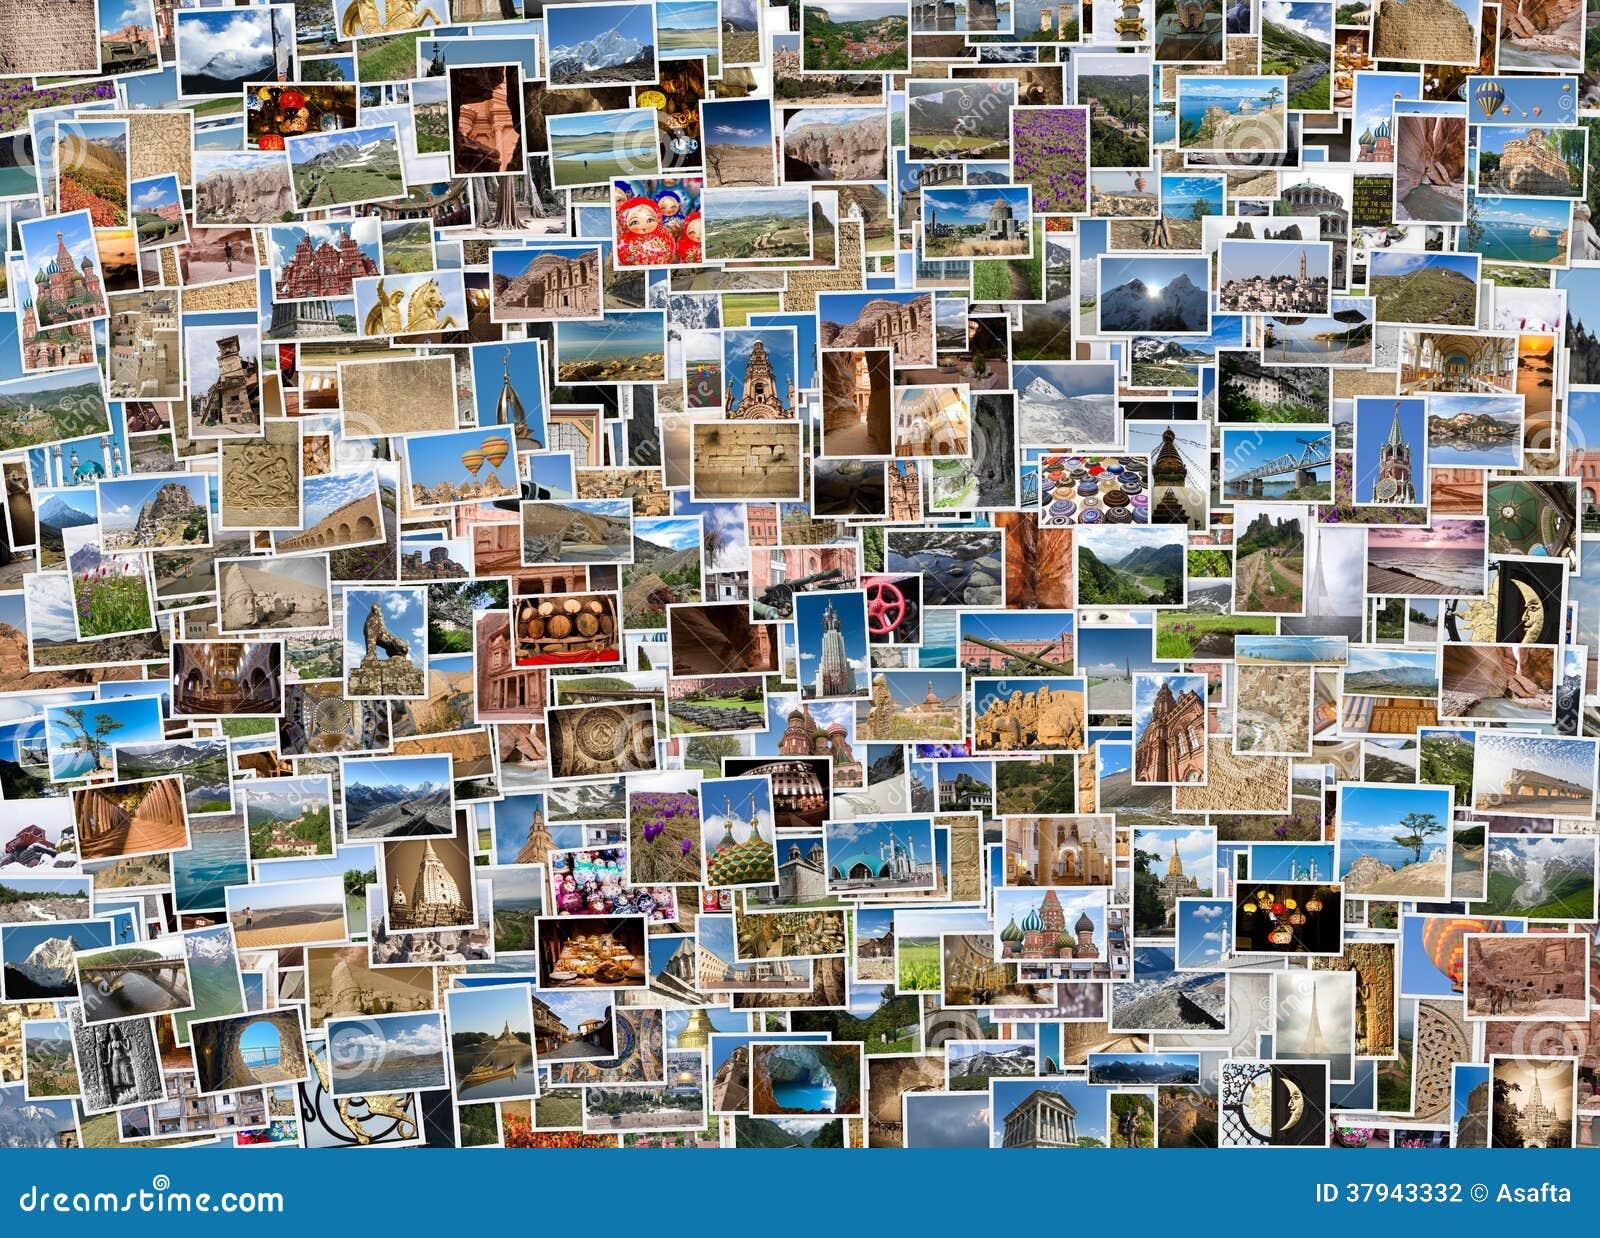 60th birthday destinations